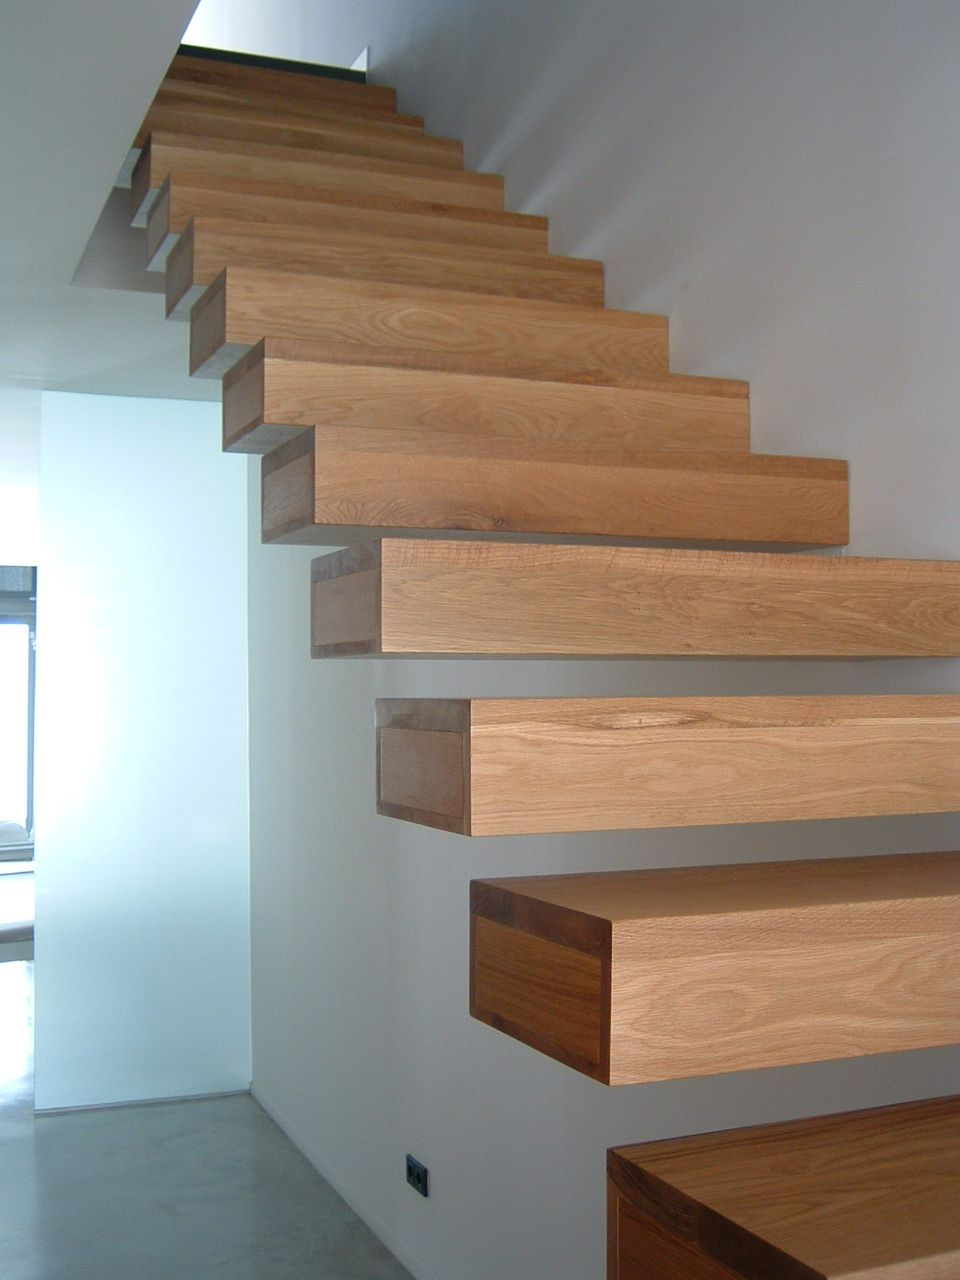 Escalera con pelda os volados interiorismo for Escalera de madera 5 pasos